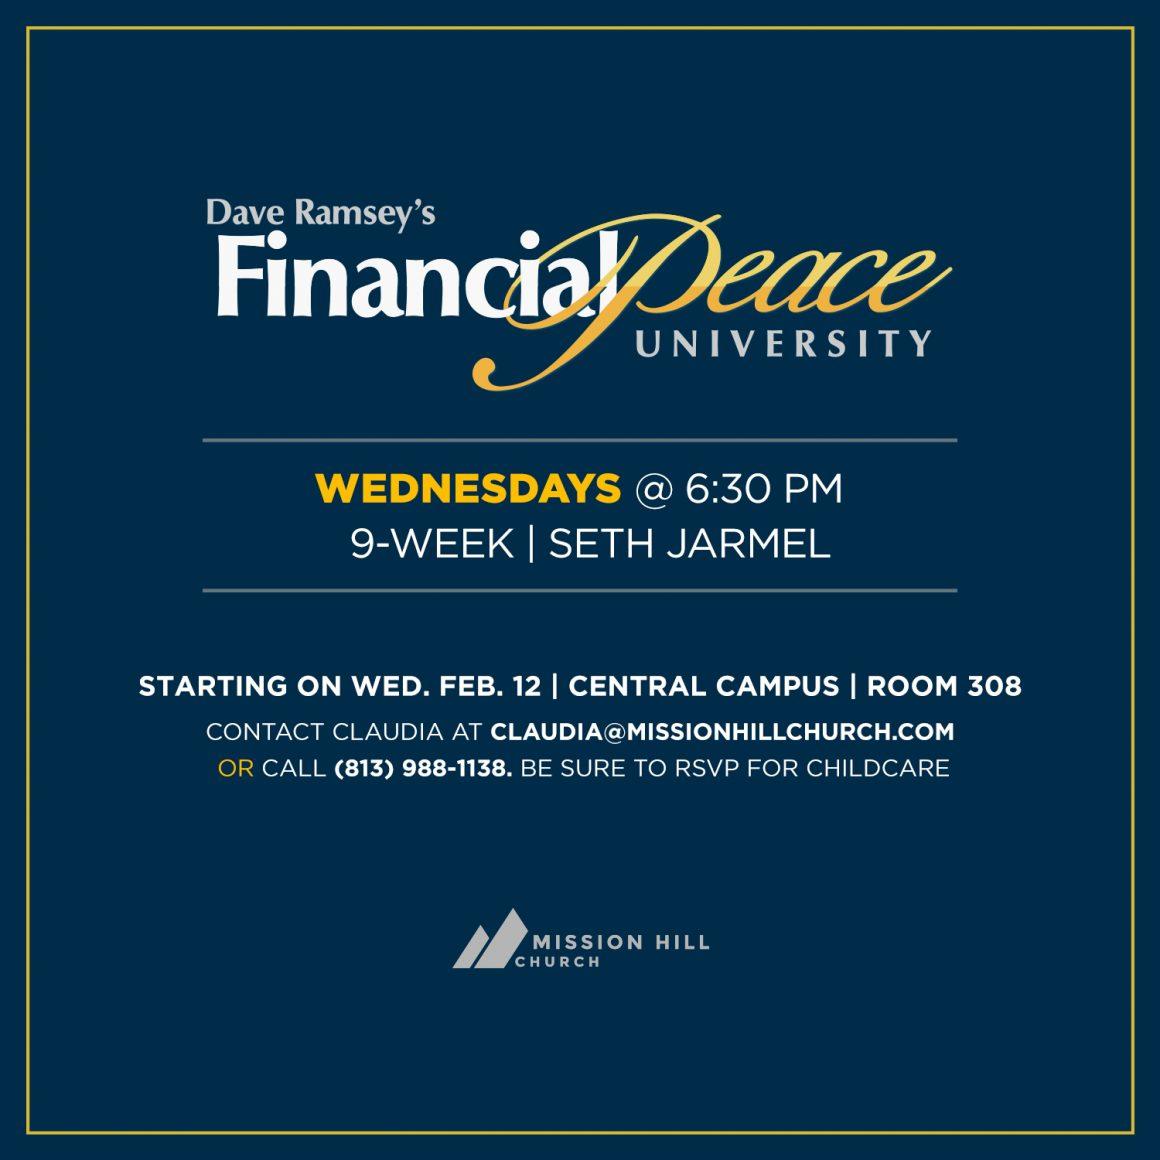 FEB. 12 // FINANCIAL PEACE UNIVERSITY BEGINS